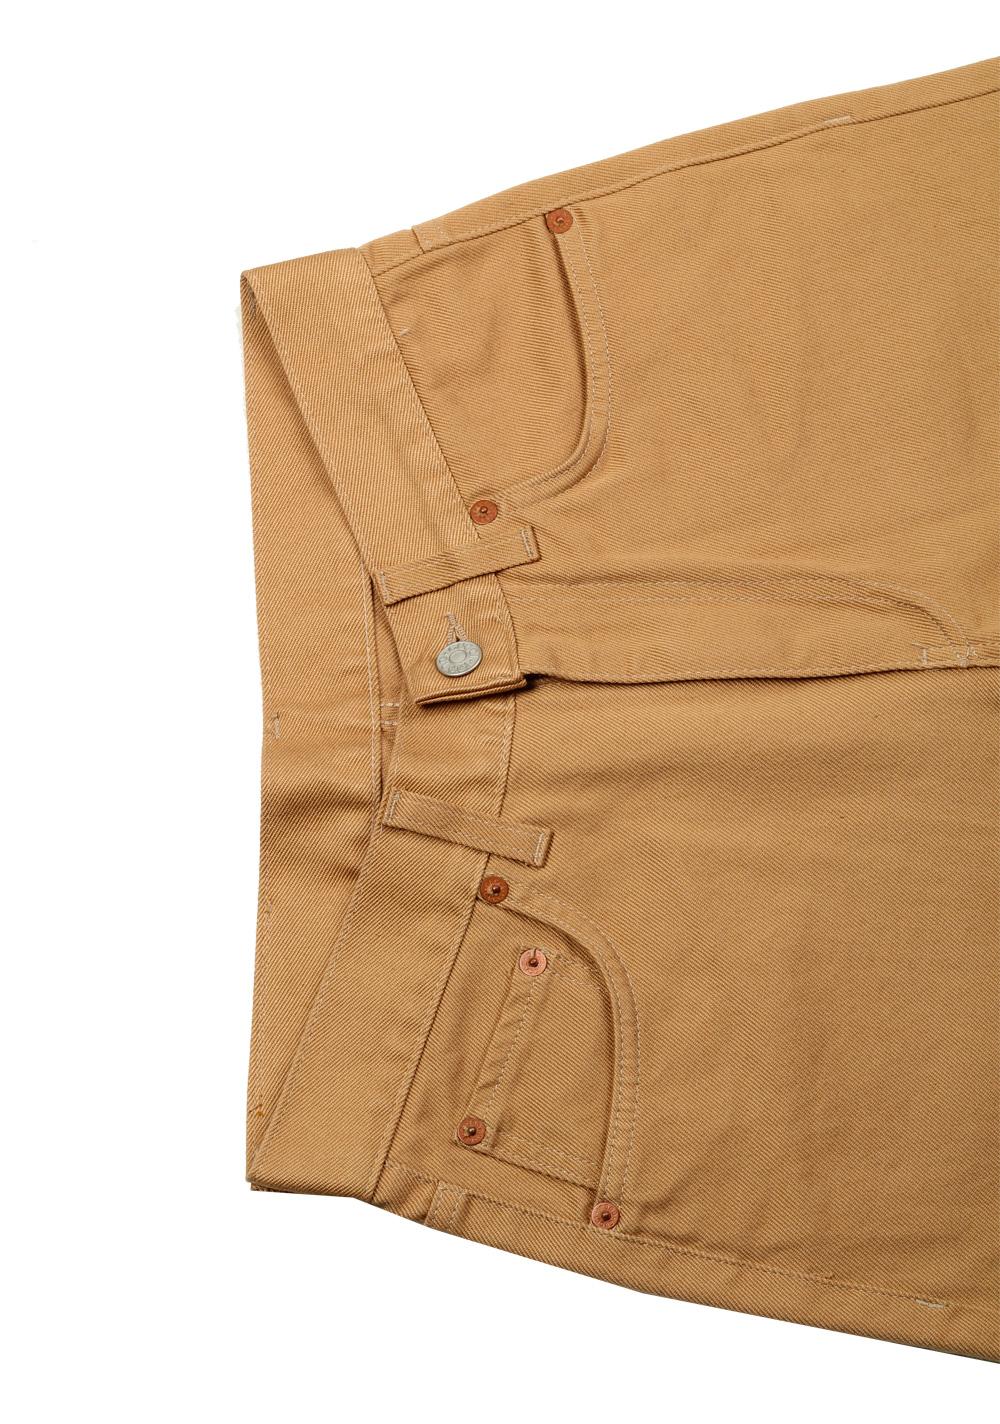 Gucci Beige Trousers Size 44 / 28 U.S. In Cotton   Costume Limité